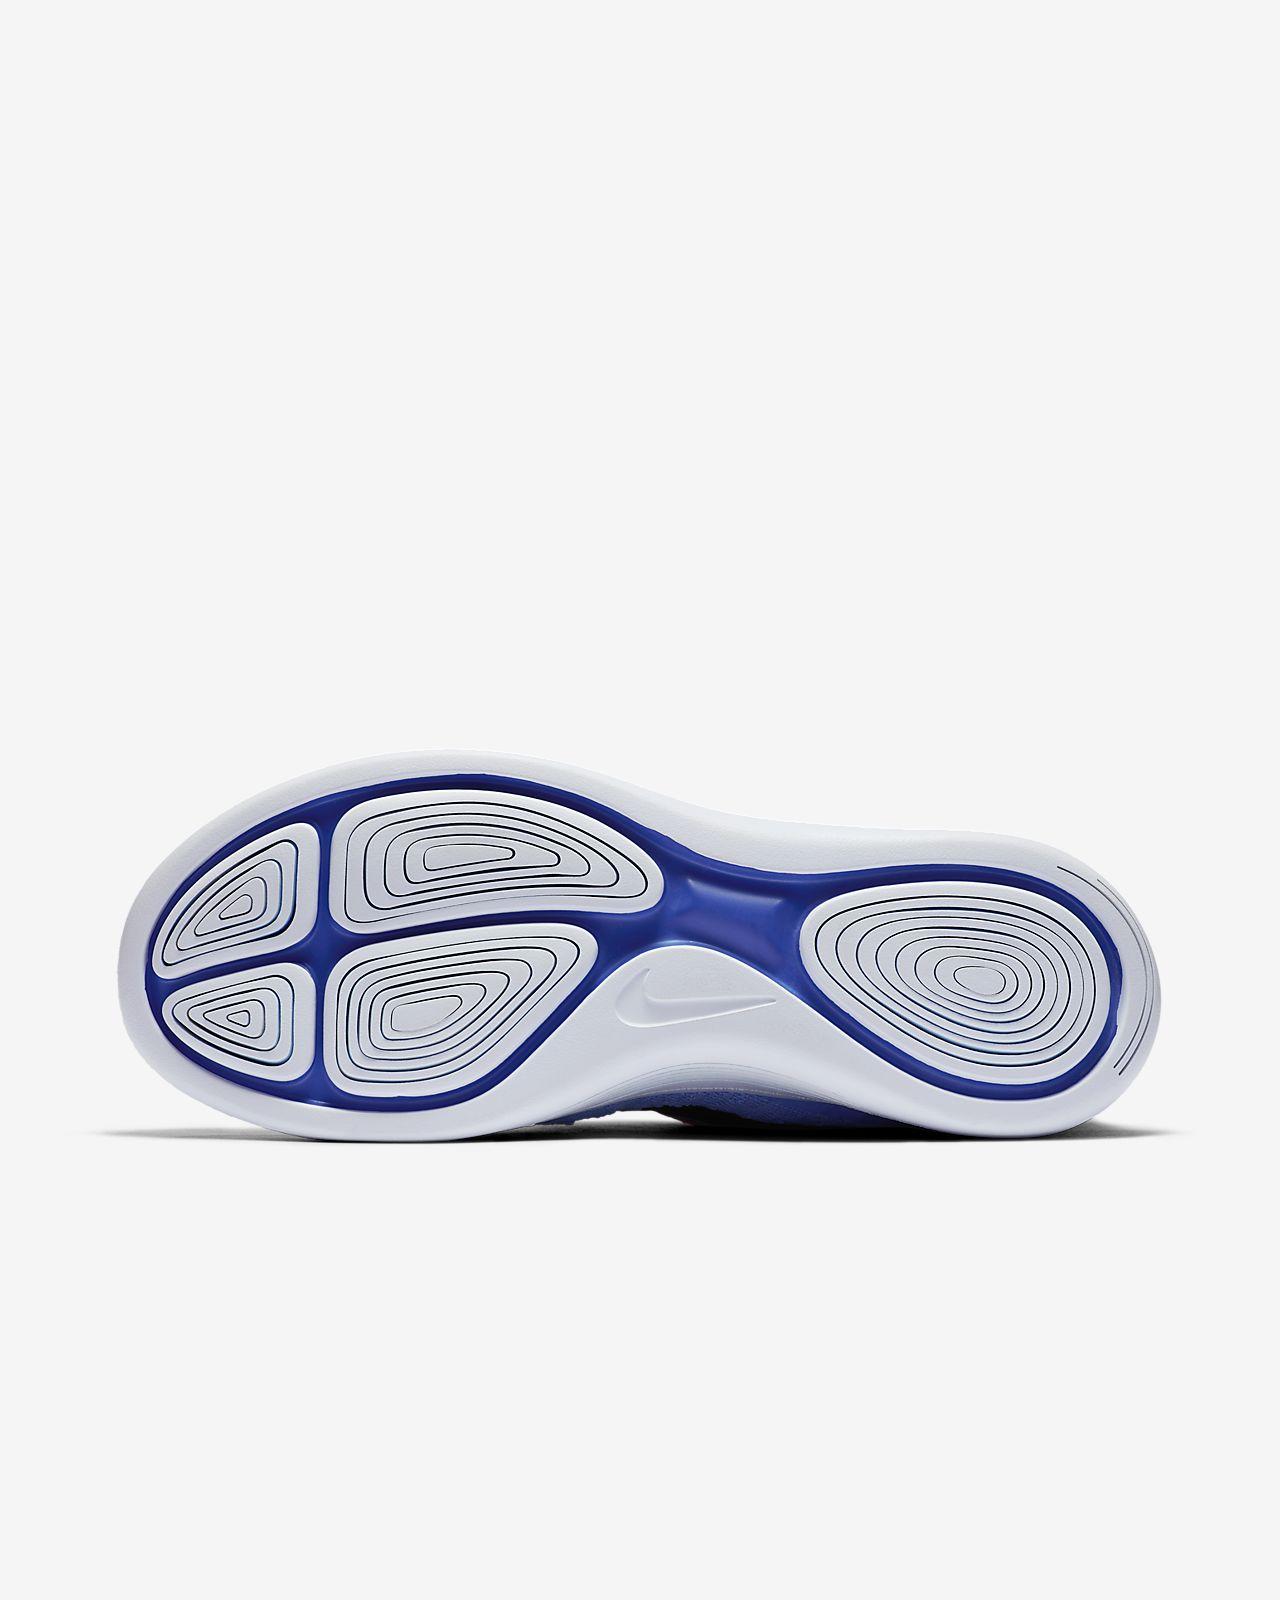 Lunarepic Flyknit De 2 Running Para Mujer Calzado Nike Low uPkXZi